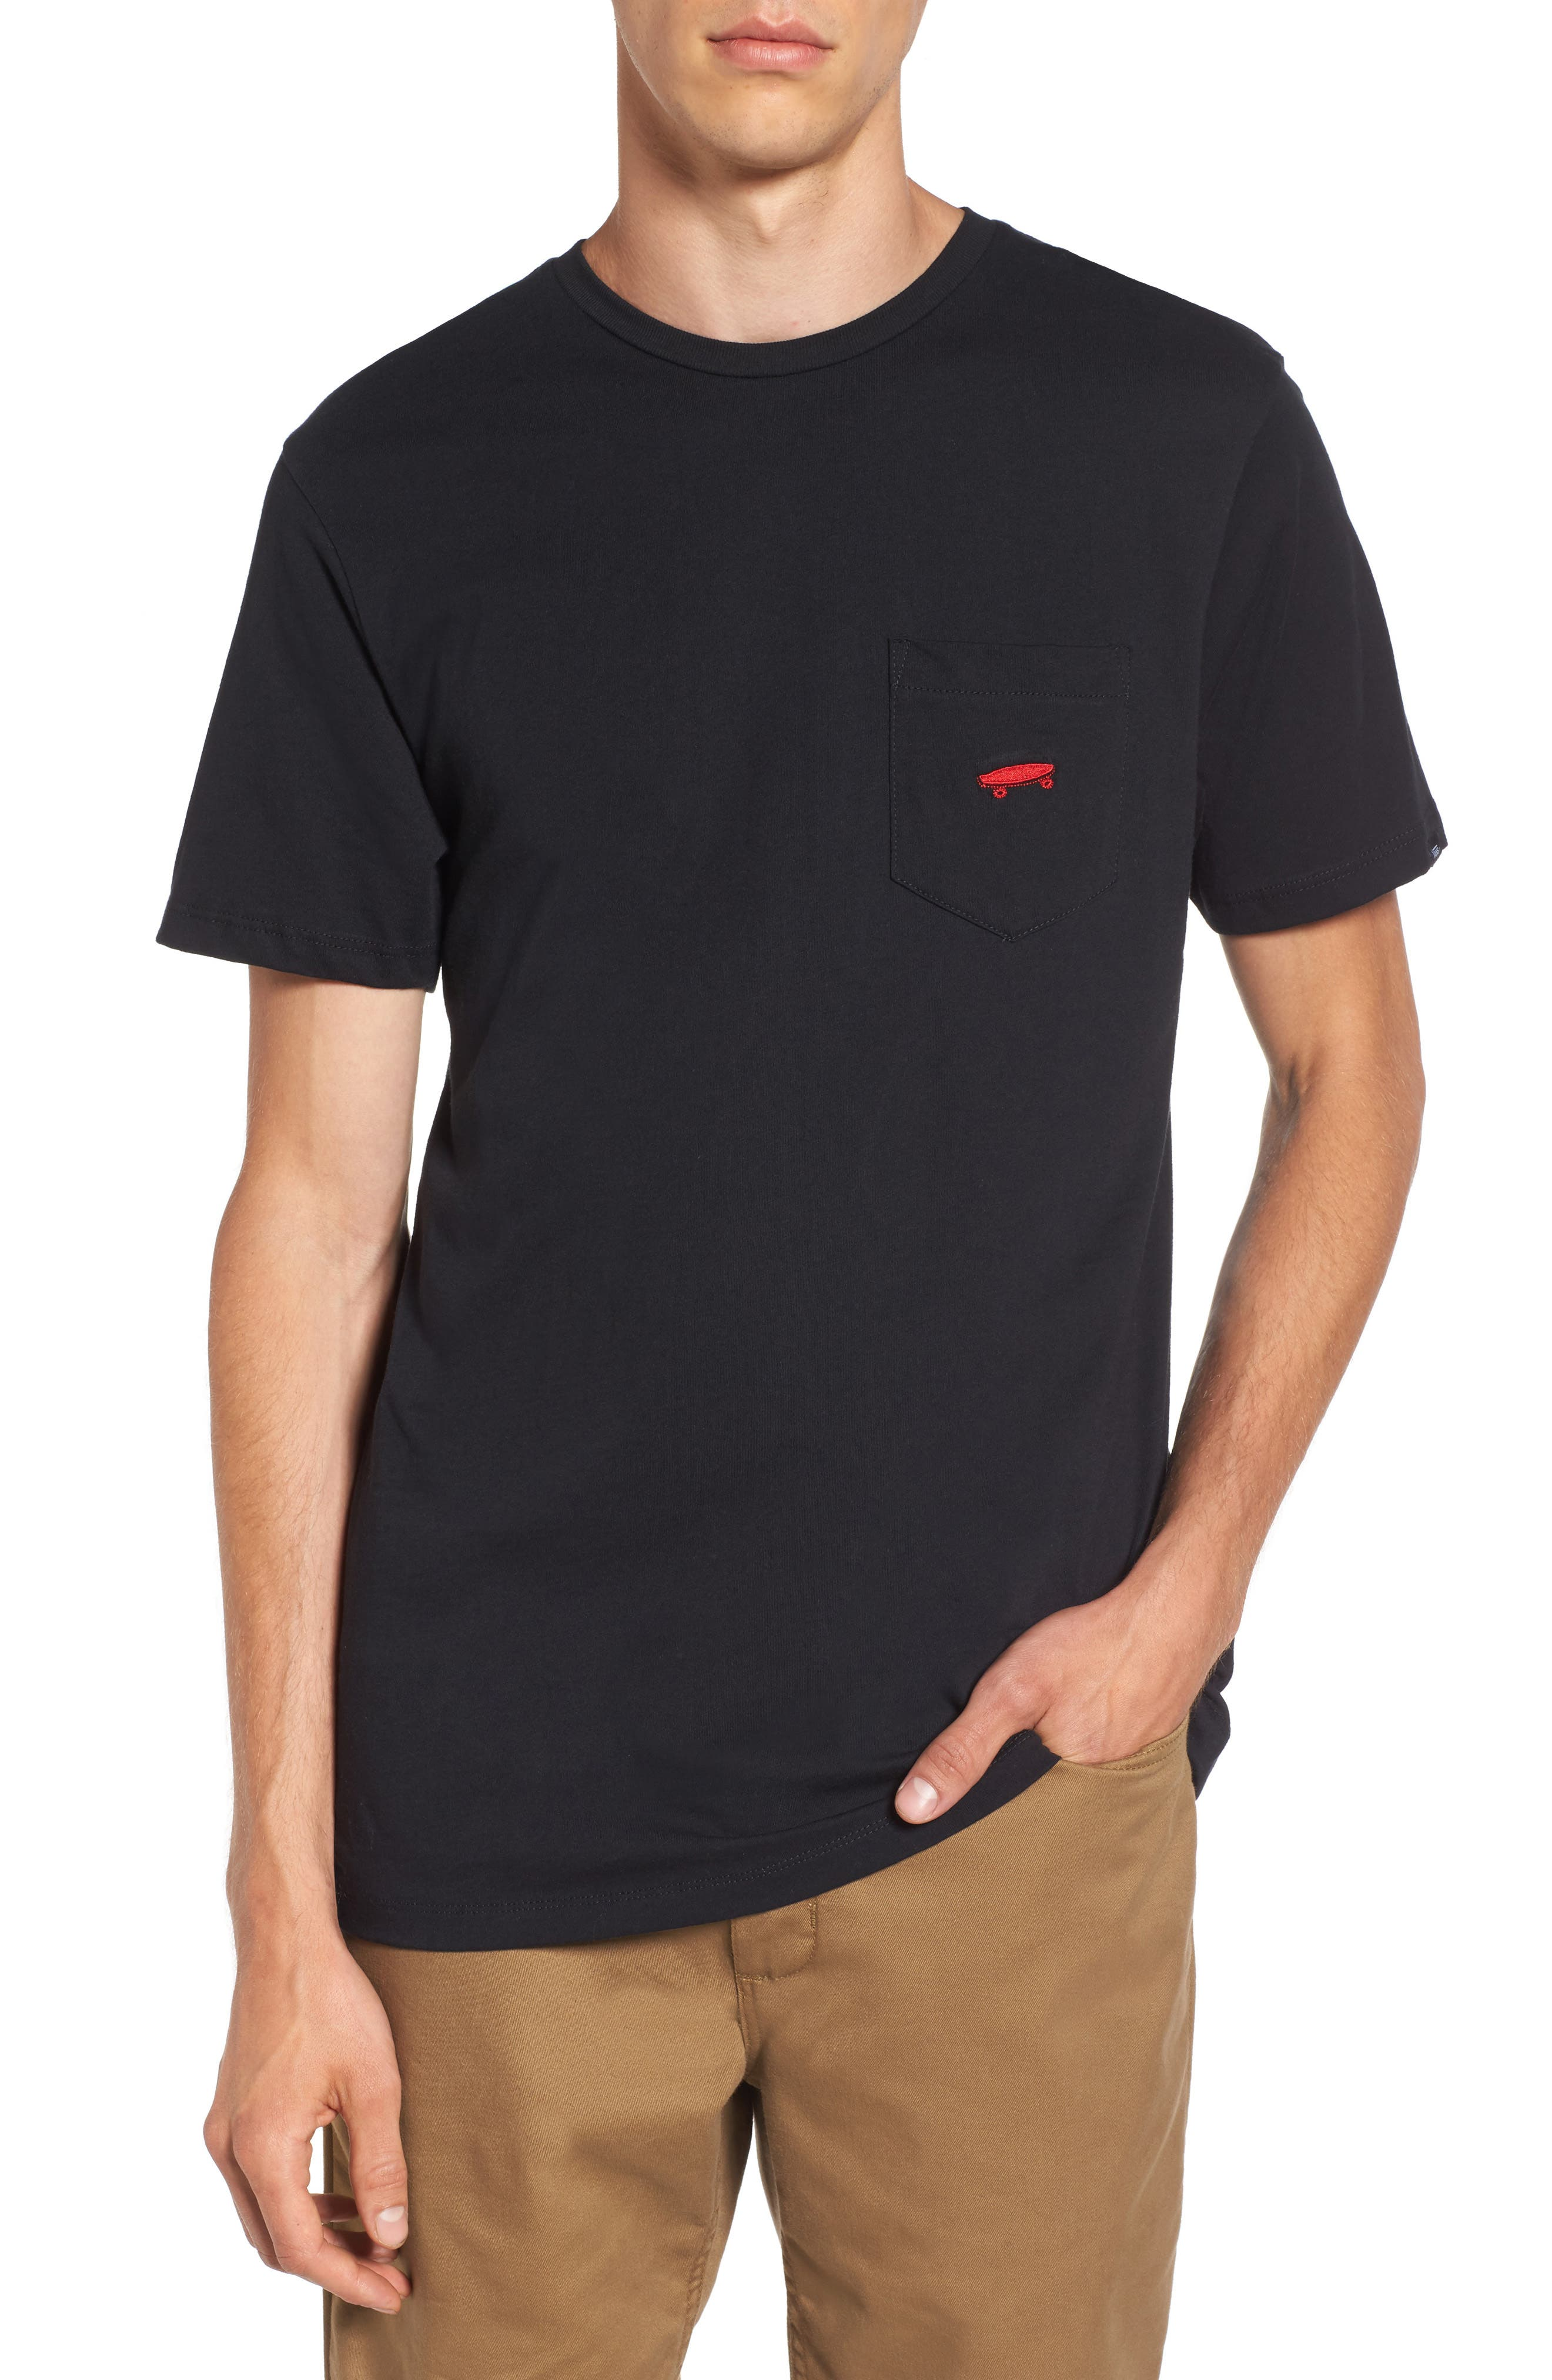 Vans Everyday Embroidered Pocket T-Shirt